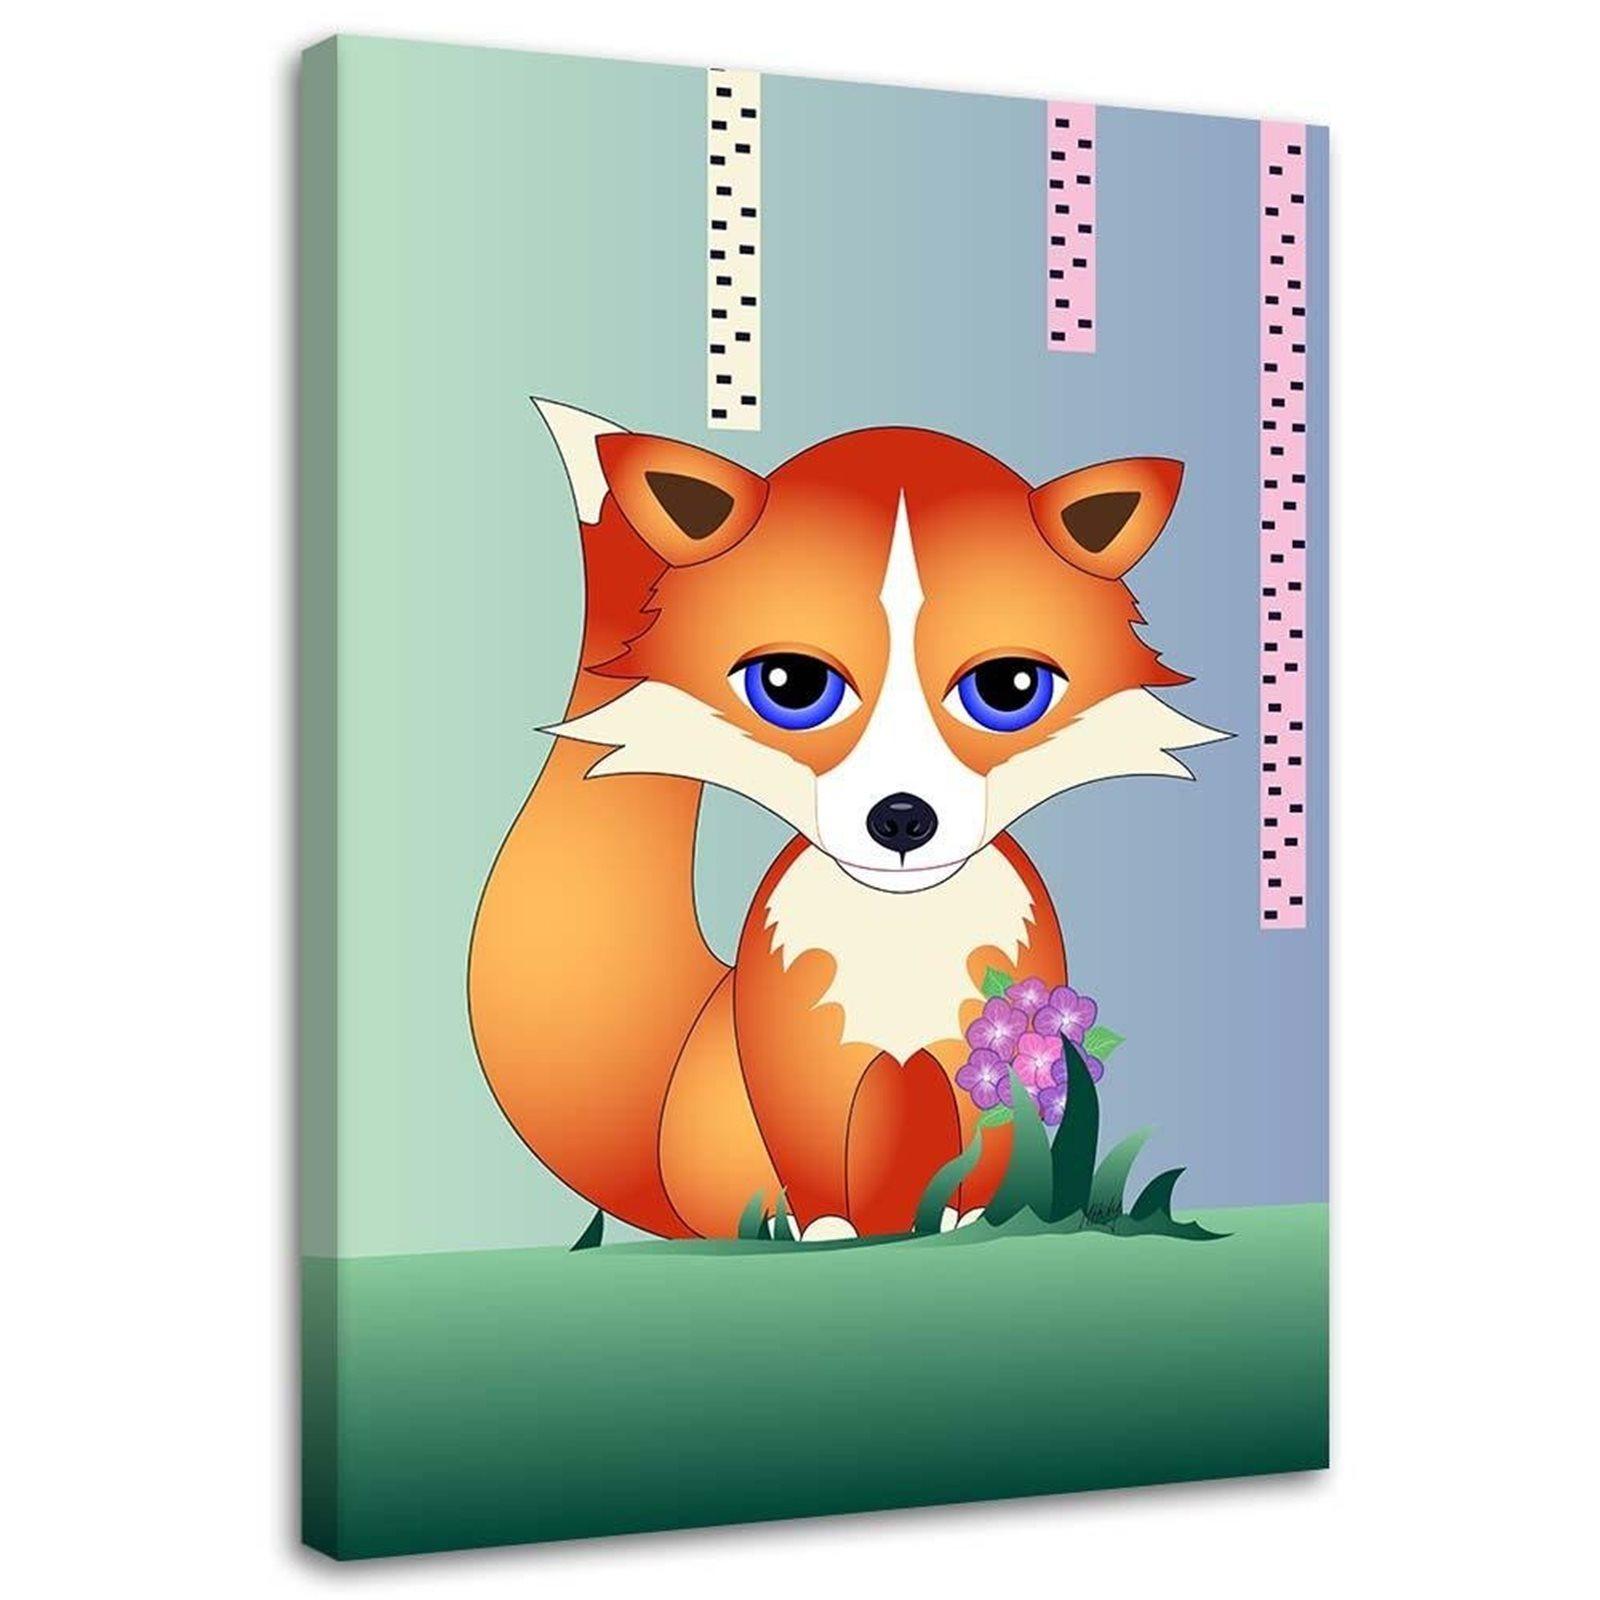 Tableau enfant a fox for children vert 70x100